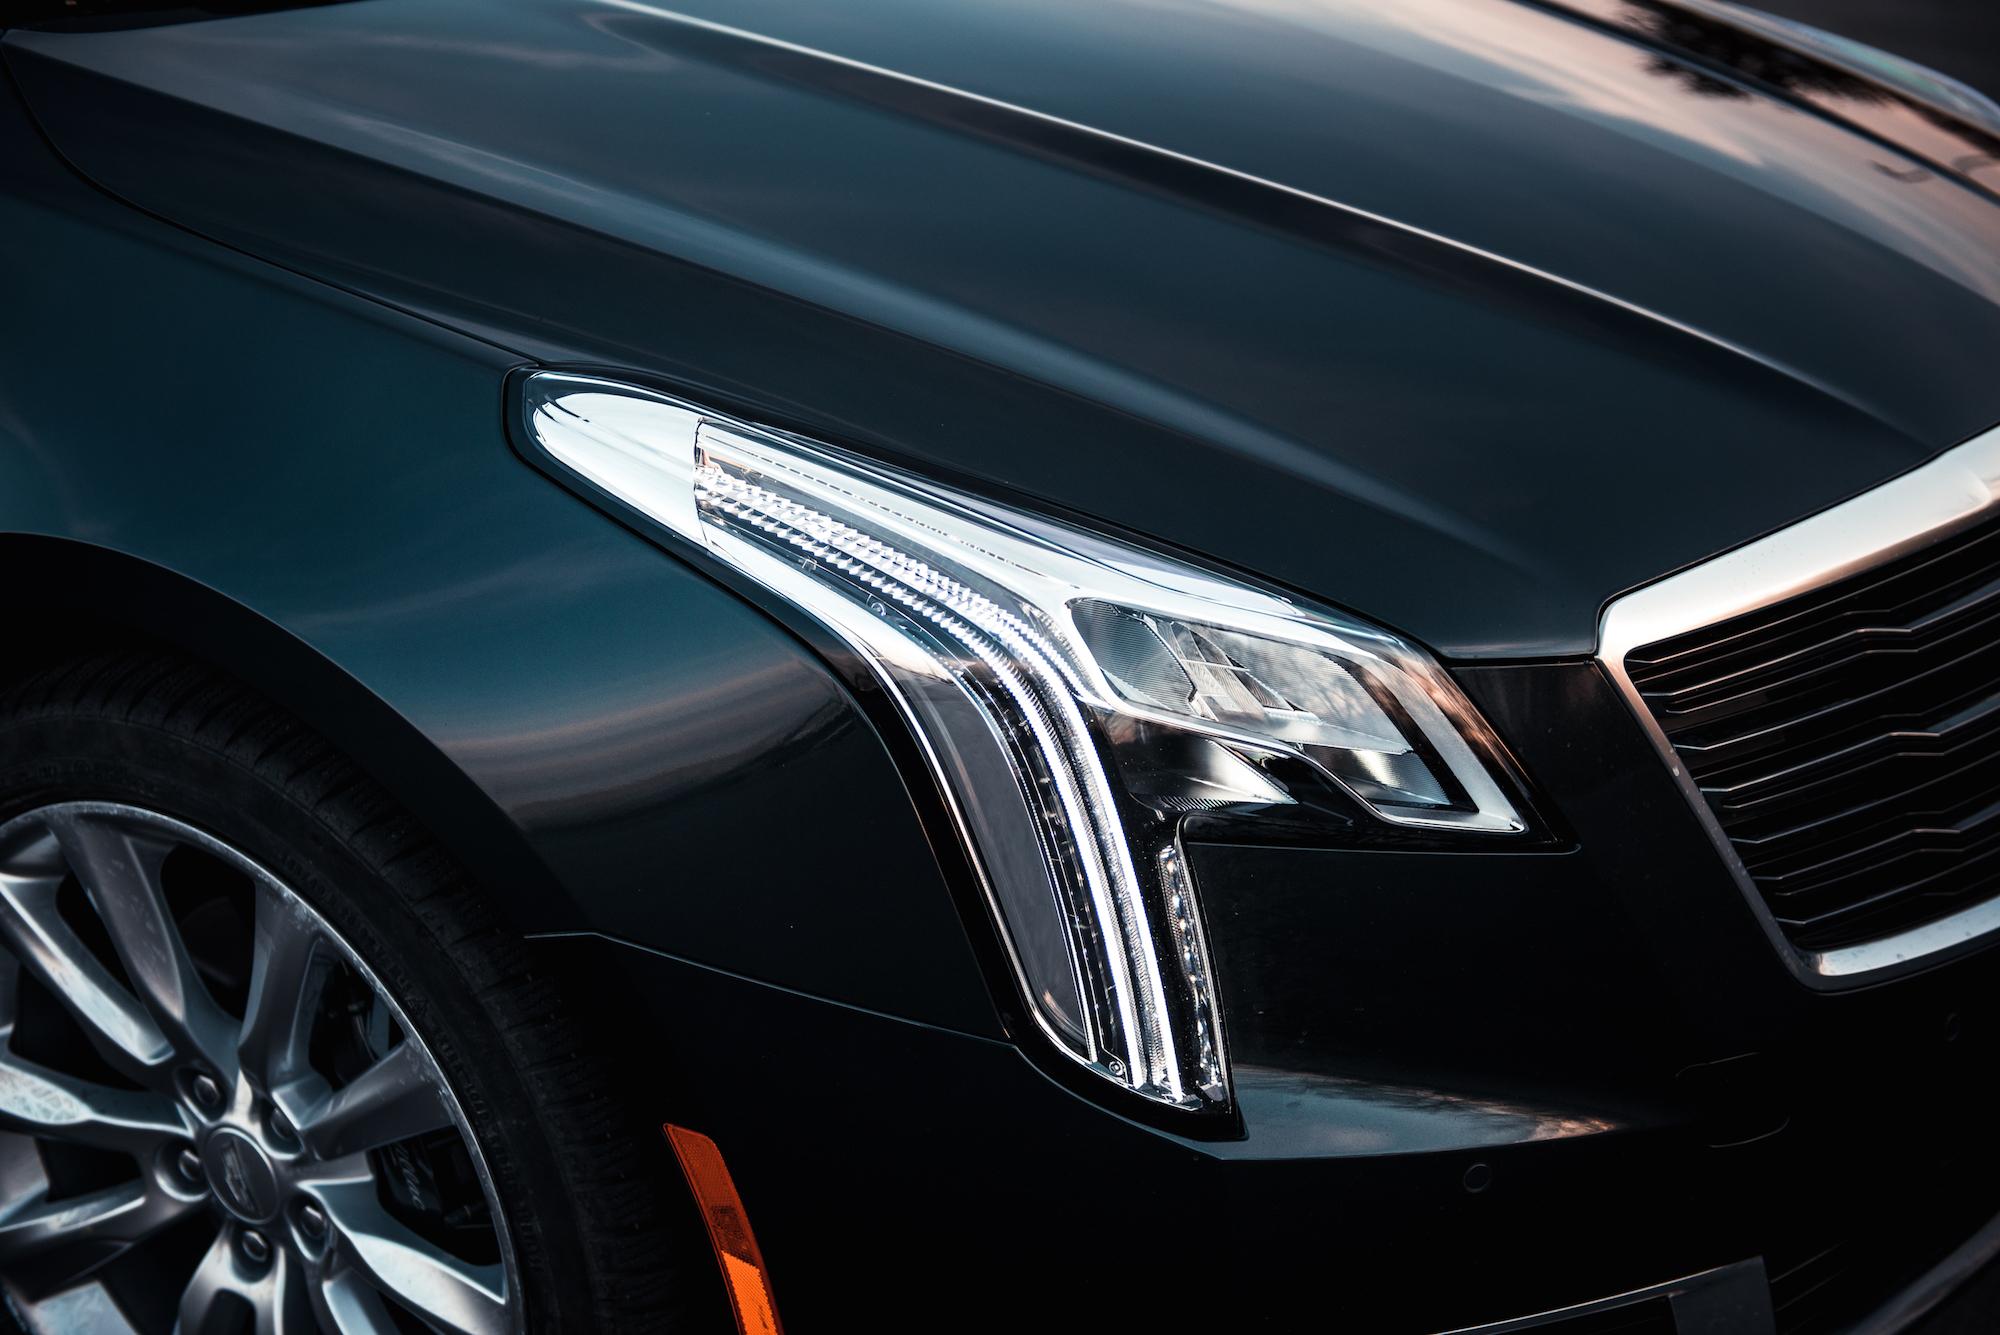 2017 Cadillac Cts 3 6 L Premium Luxury >> Review: 2018 Cadillac XTS V-Sport Platinum | CAR